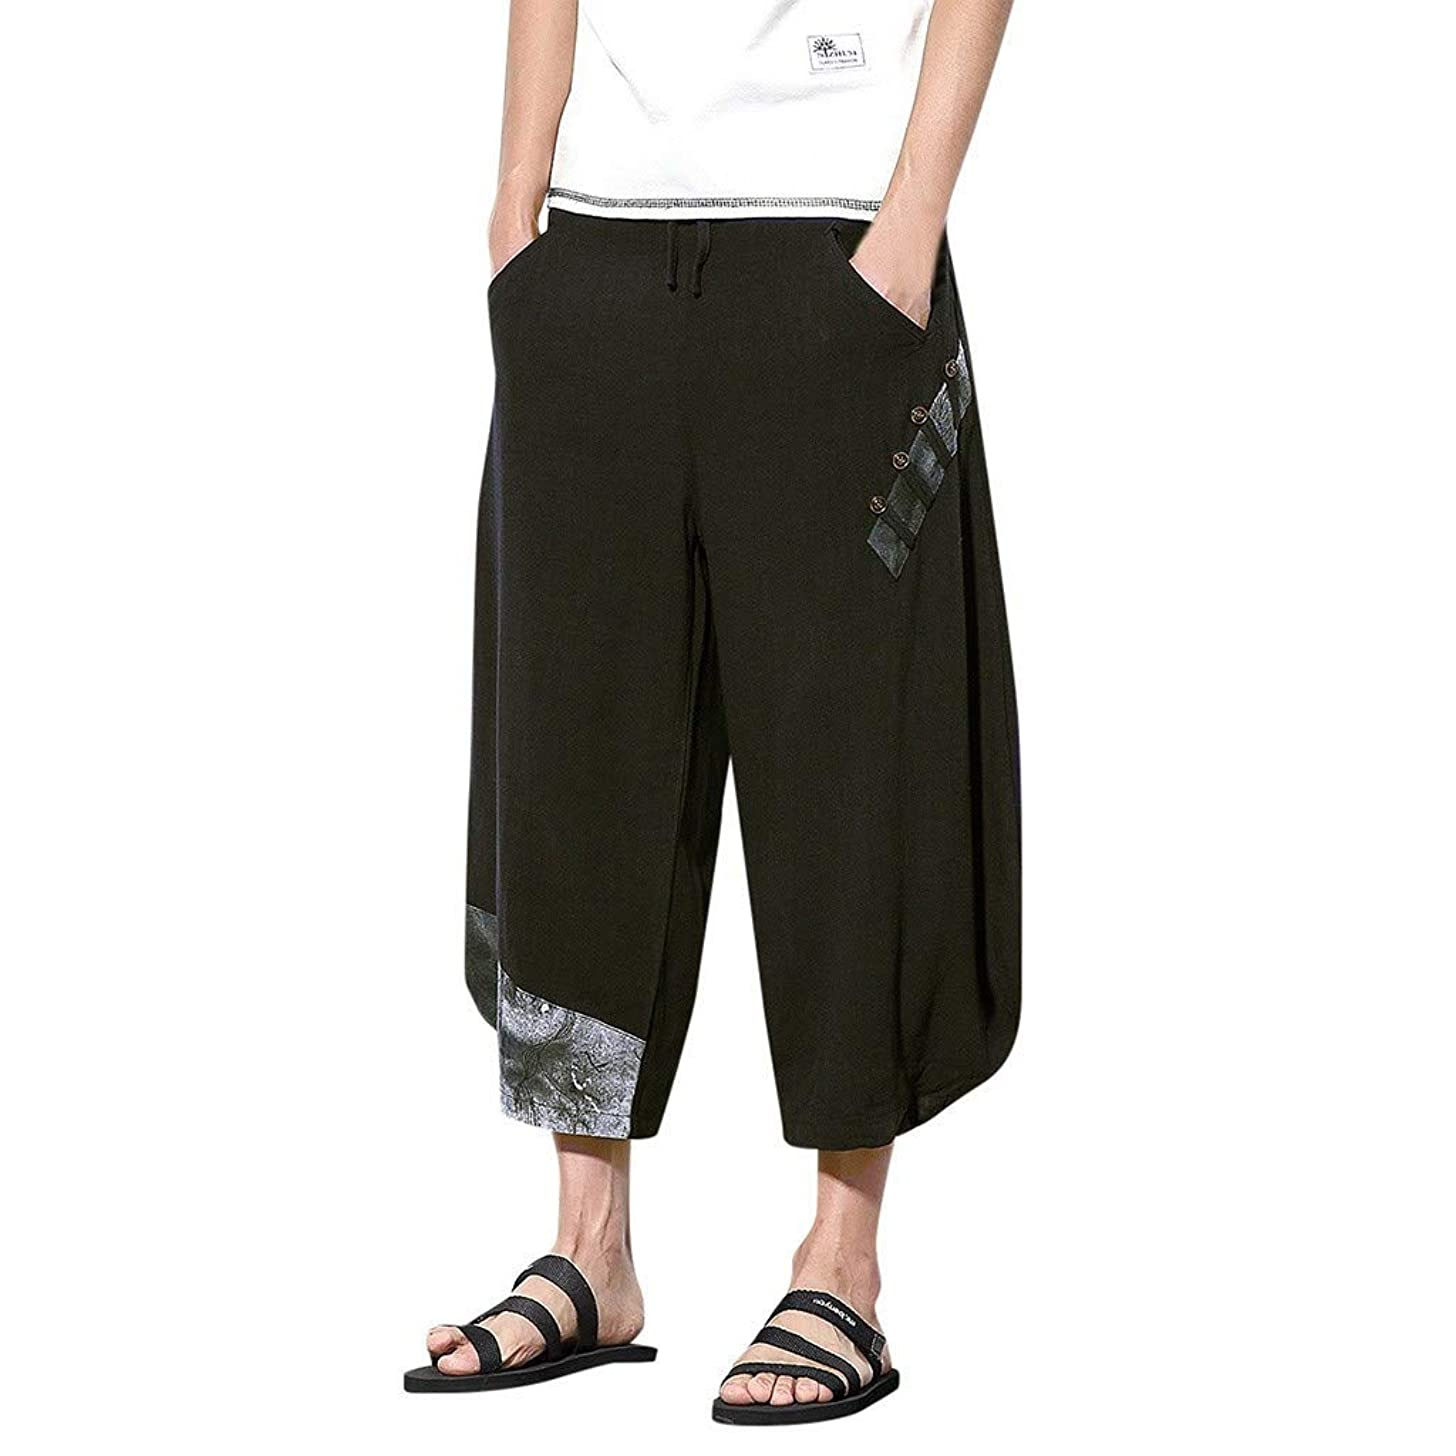 BingYELH Men's Patchwork Shorts Loose Linen Harem Capri Pants Drawstring Gym Fitness Joggers Workout Yoga Pants